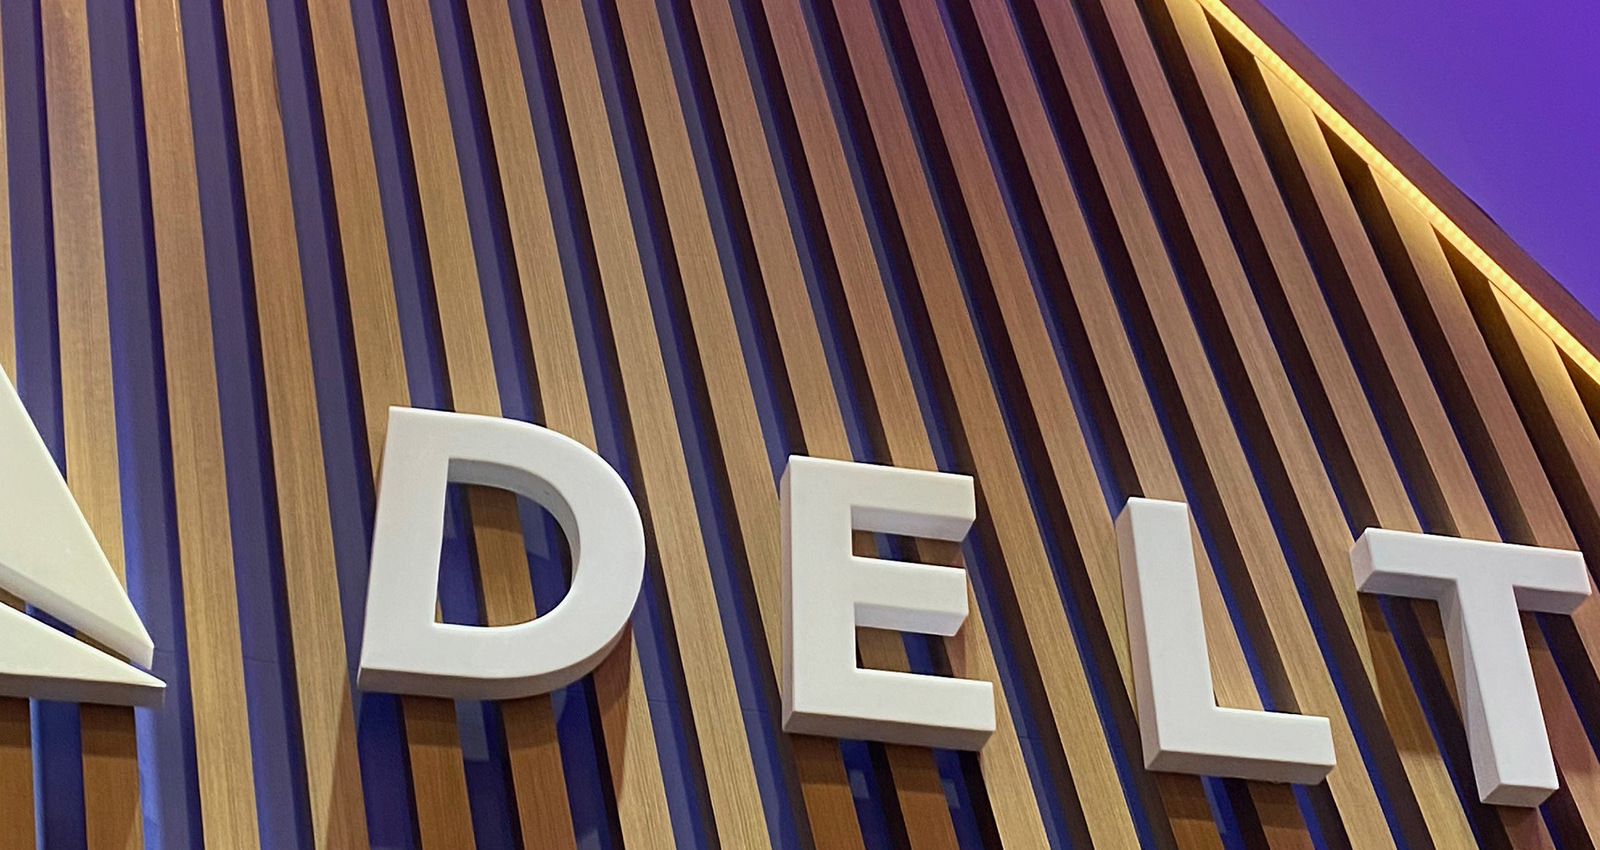 Delta @ CES: The New Feel Of Flight